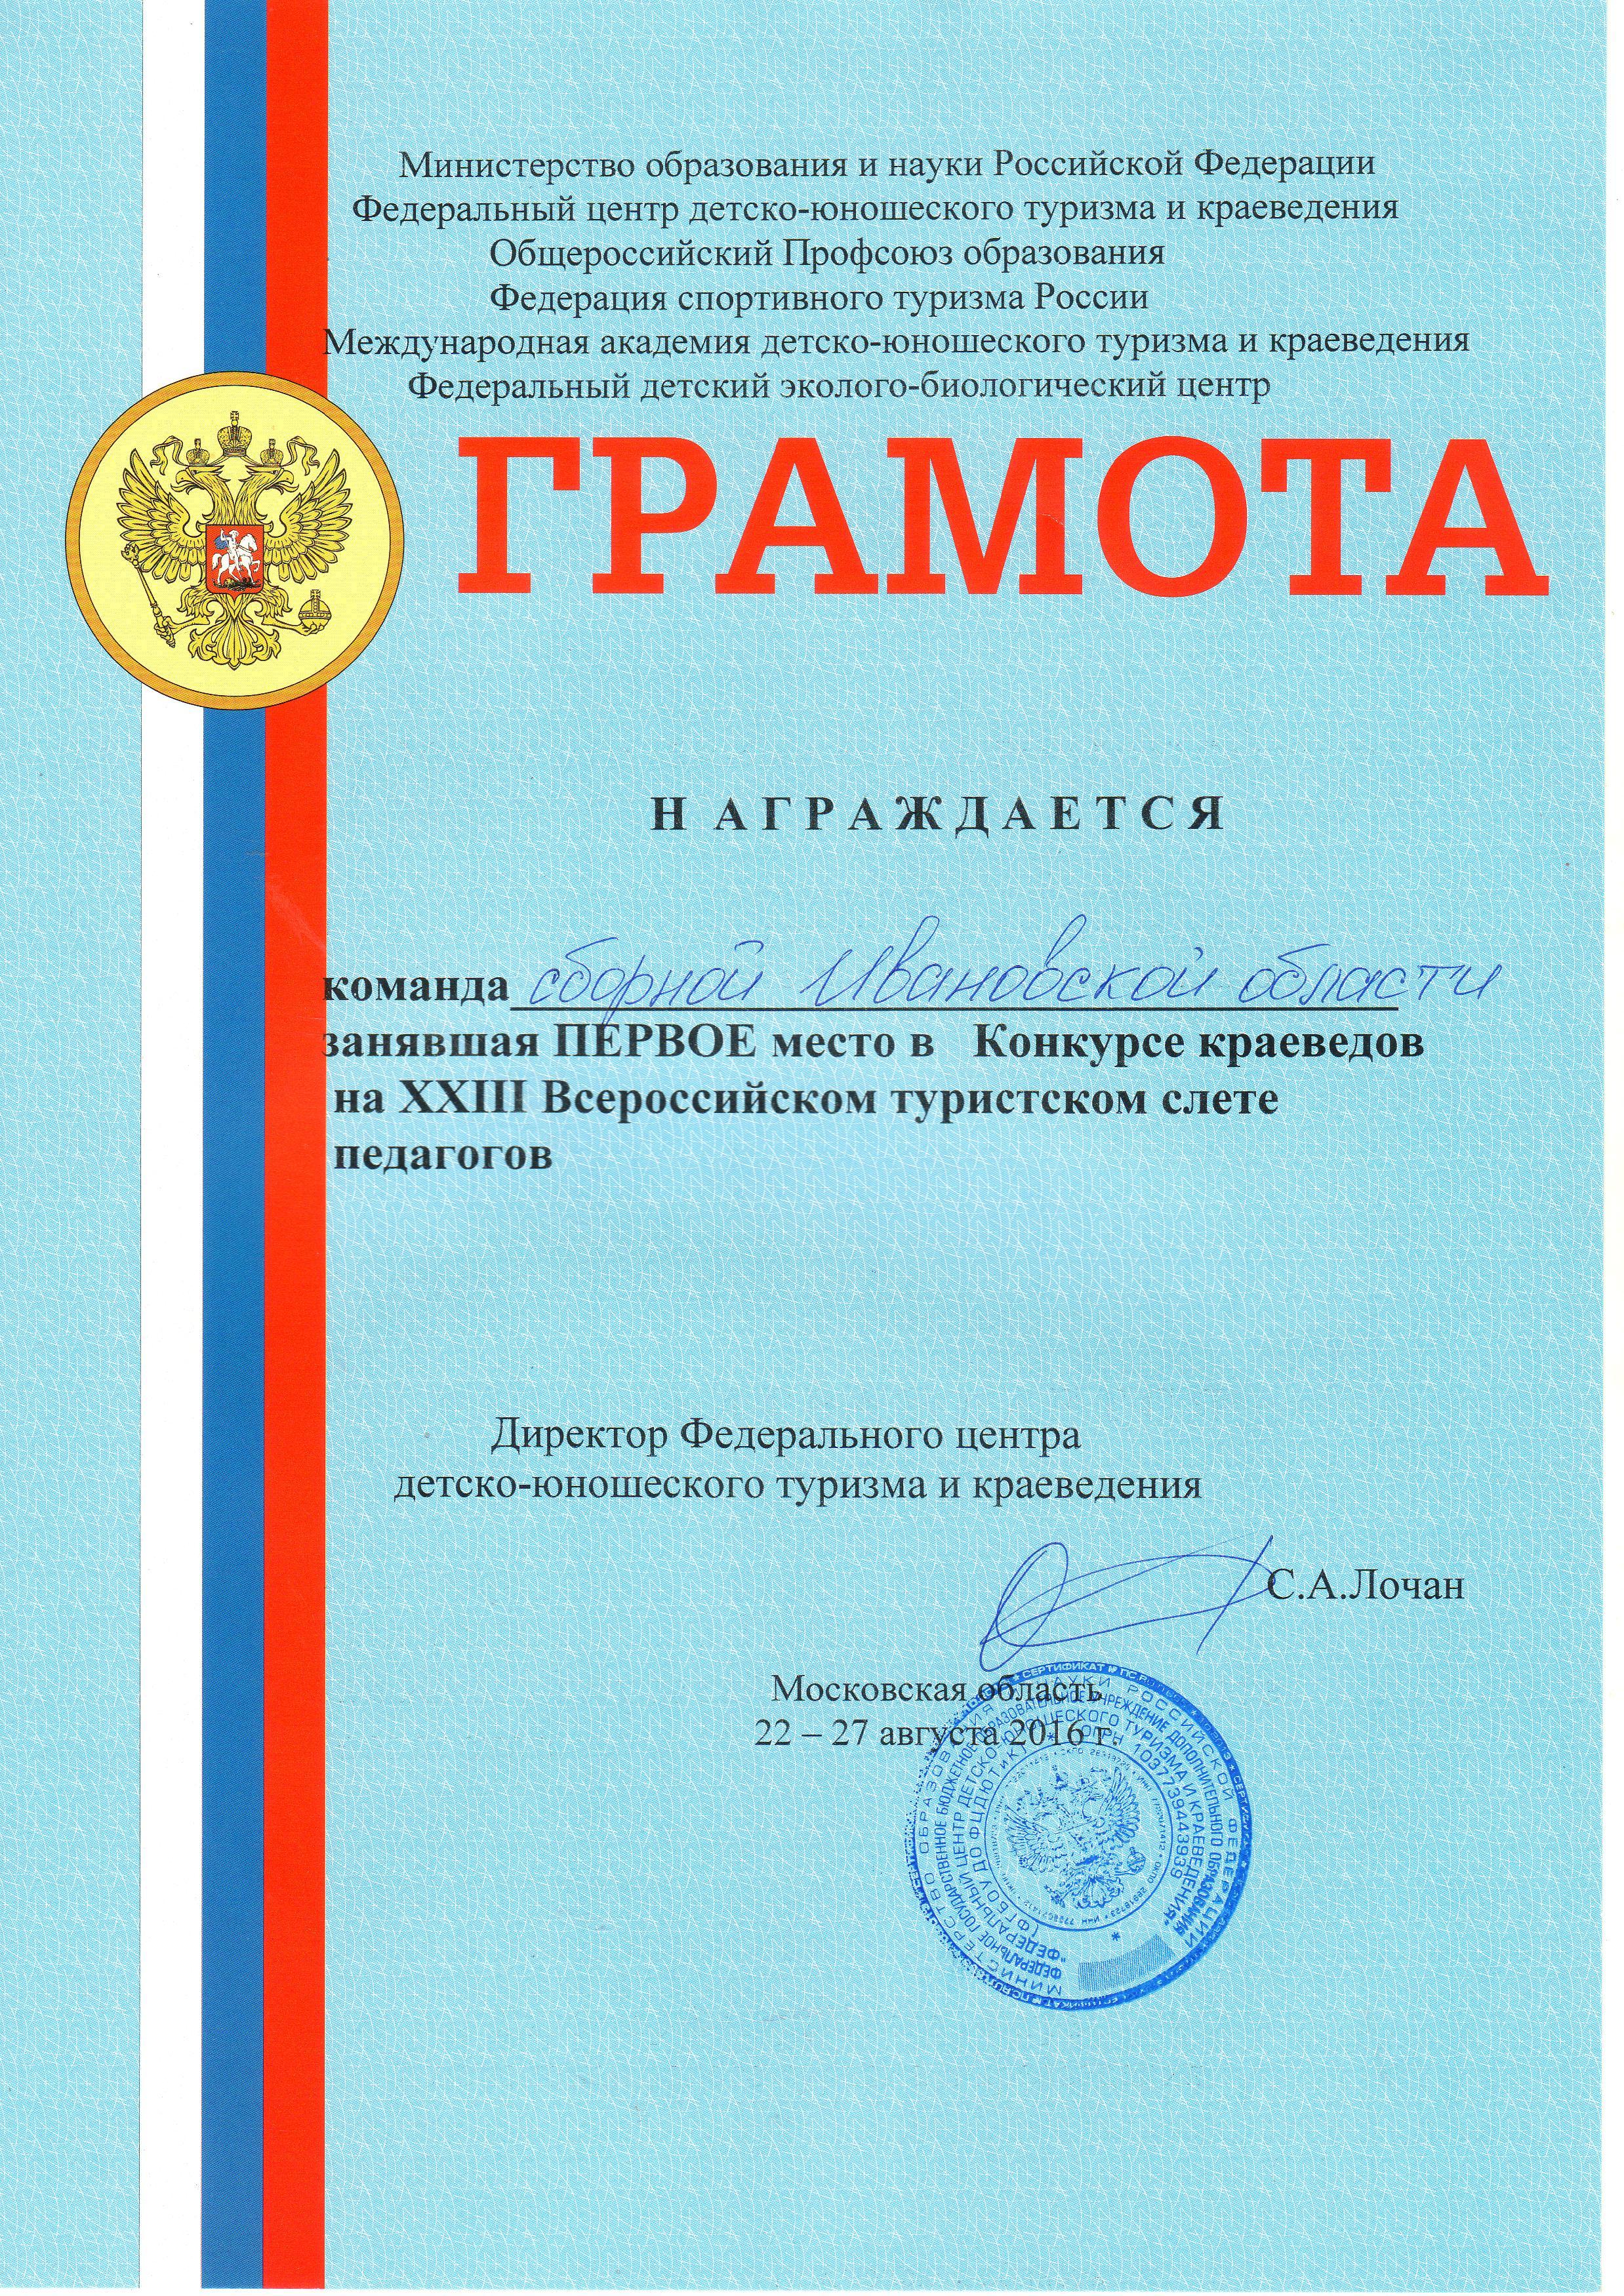 2016-0003